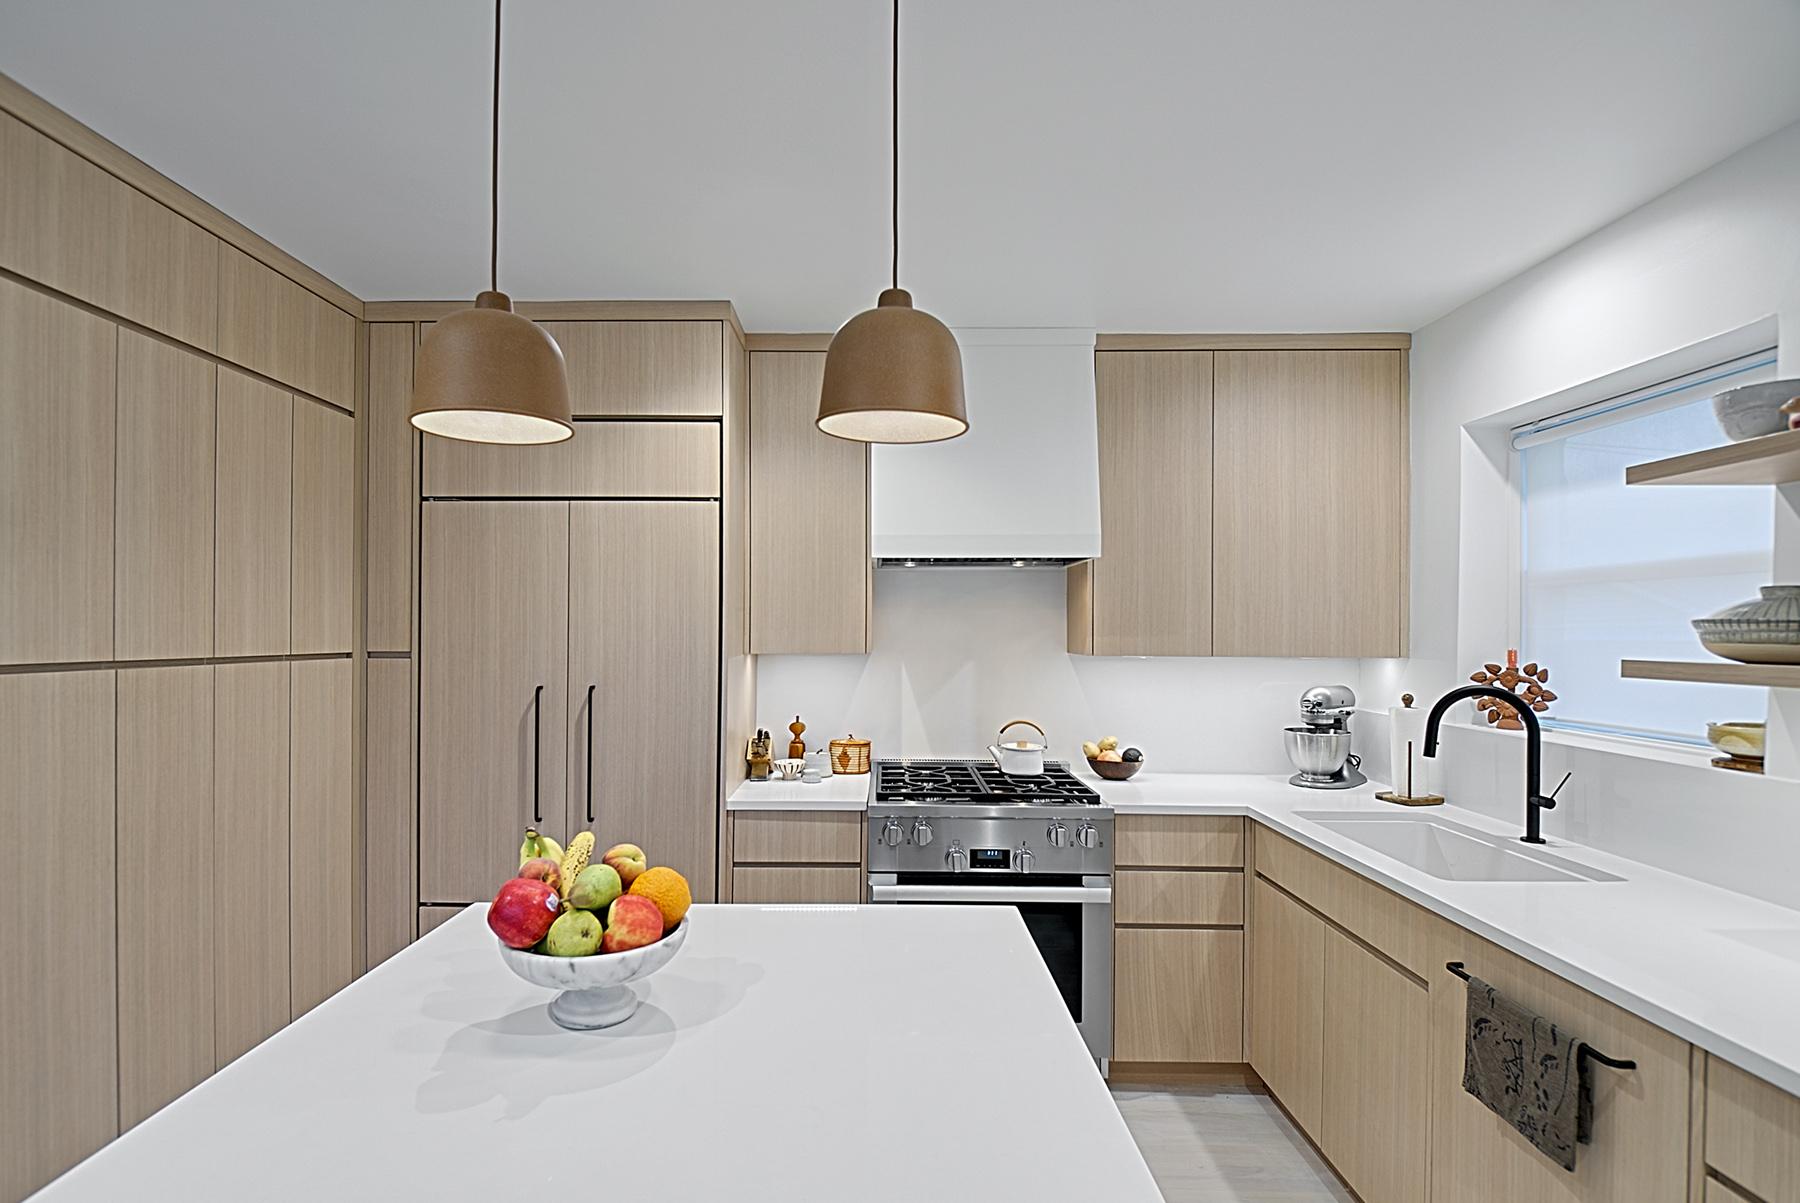 Modern Kitchen Remodel-Chicago - Benvenuti and Stein on Kitchen Remodel Modern  id=75021